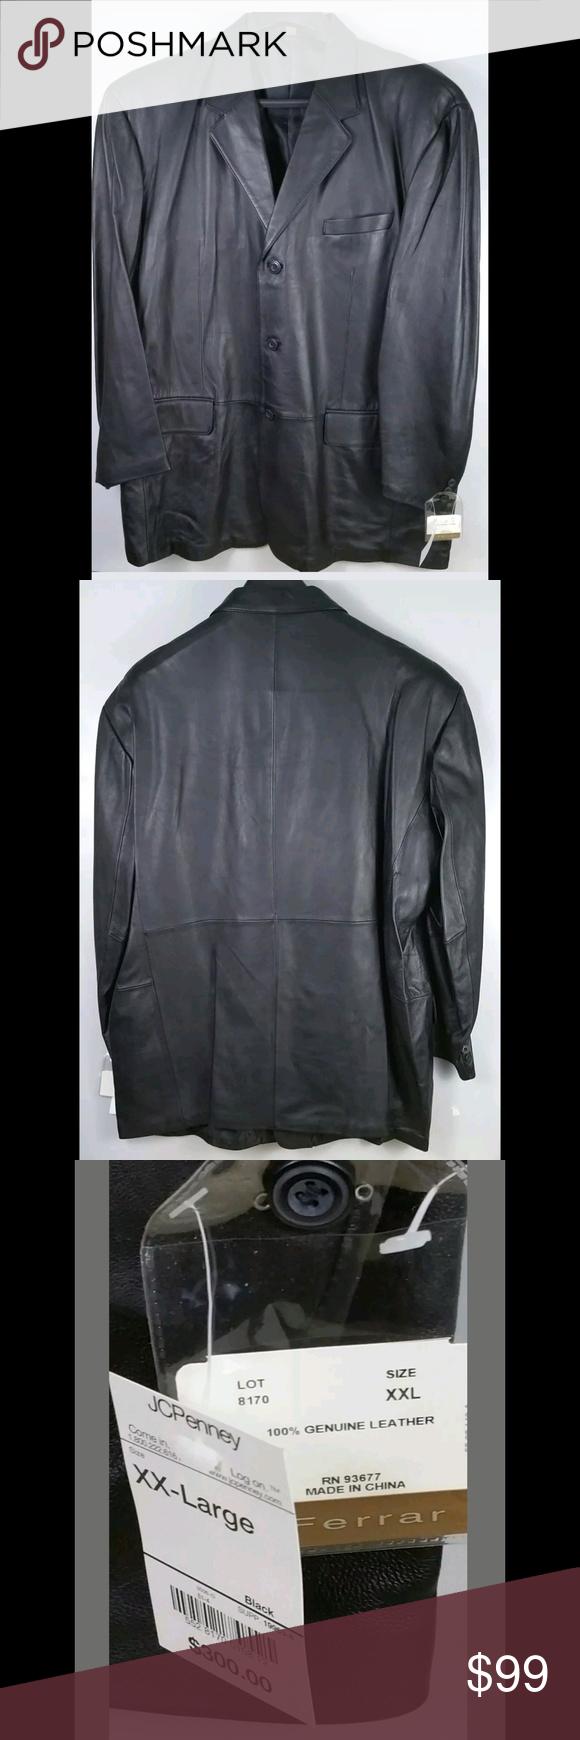 New J Ferrar Leather Jacket Mens Size Xxl Black New J Ferrar Leather Jacket Mens Xxl Color Black Re Leather Jacket Men Clothes Design Fashion Design